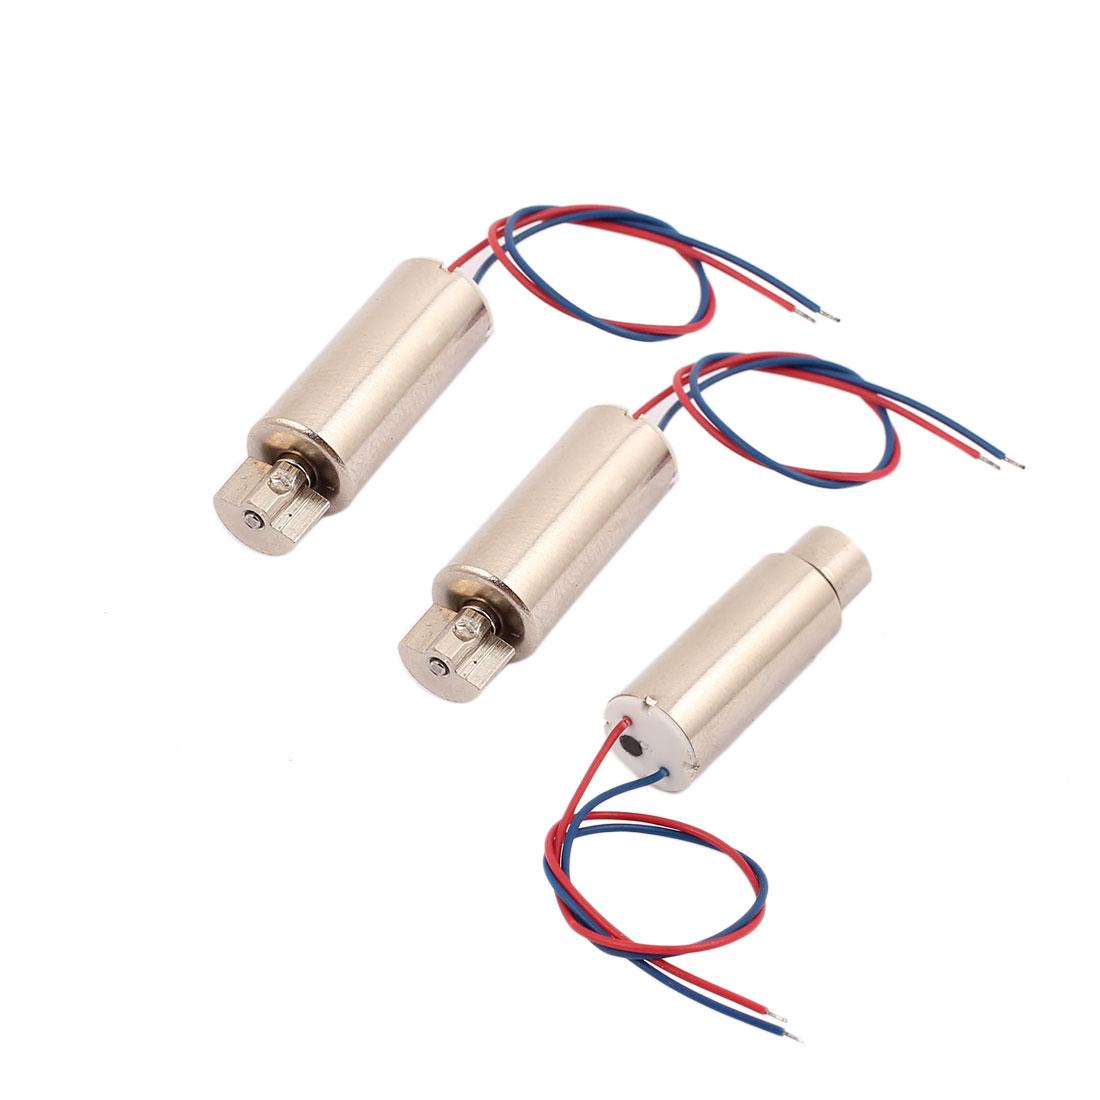 3Pcs DC 1.5V-4.5V 50000RPM High Speed Vibration Motor Magnetic 716 Coreless Motor